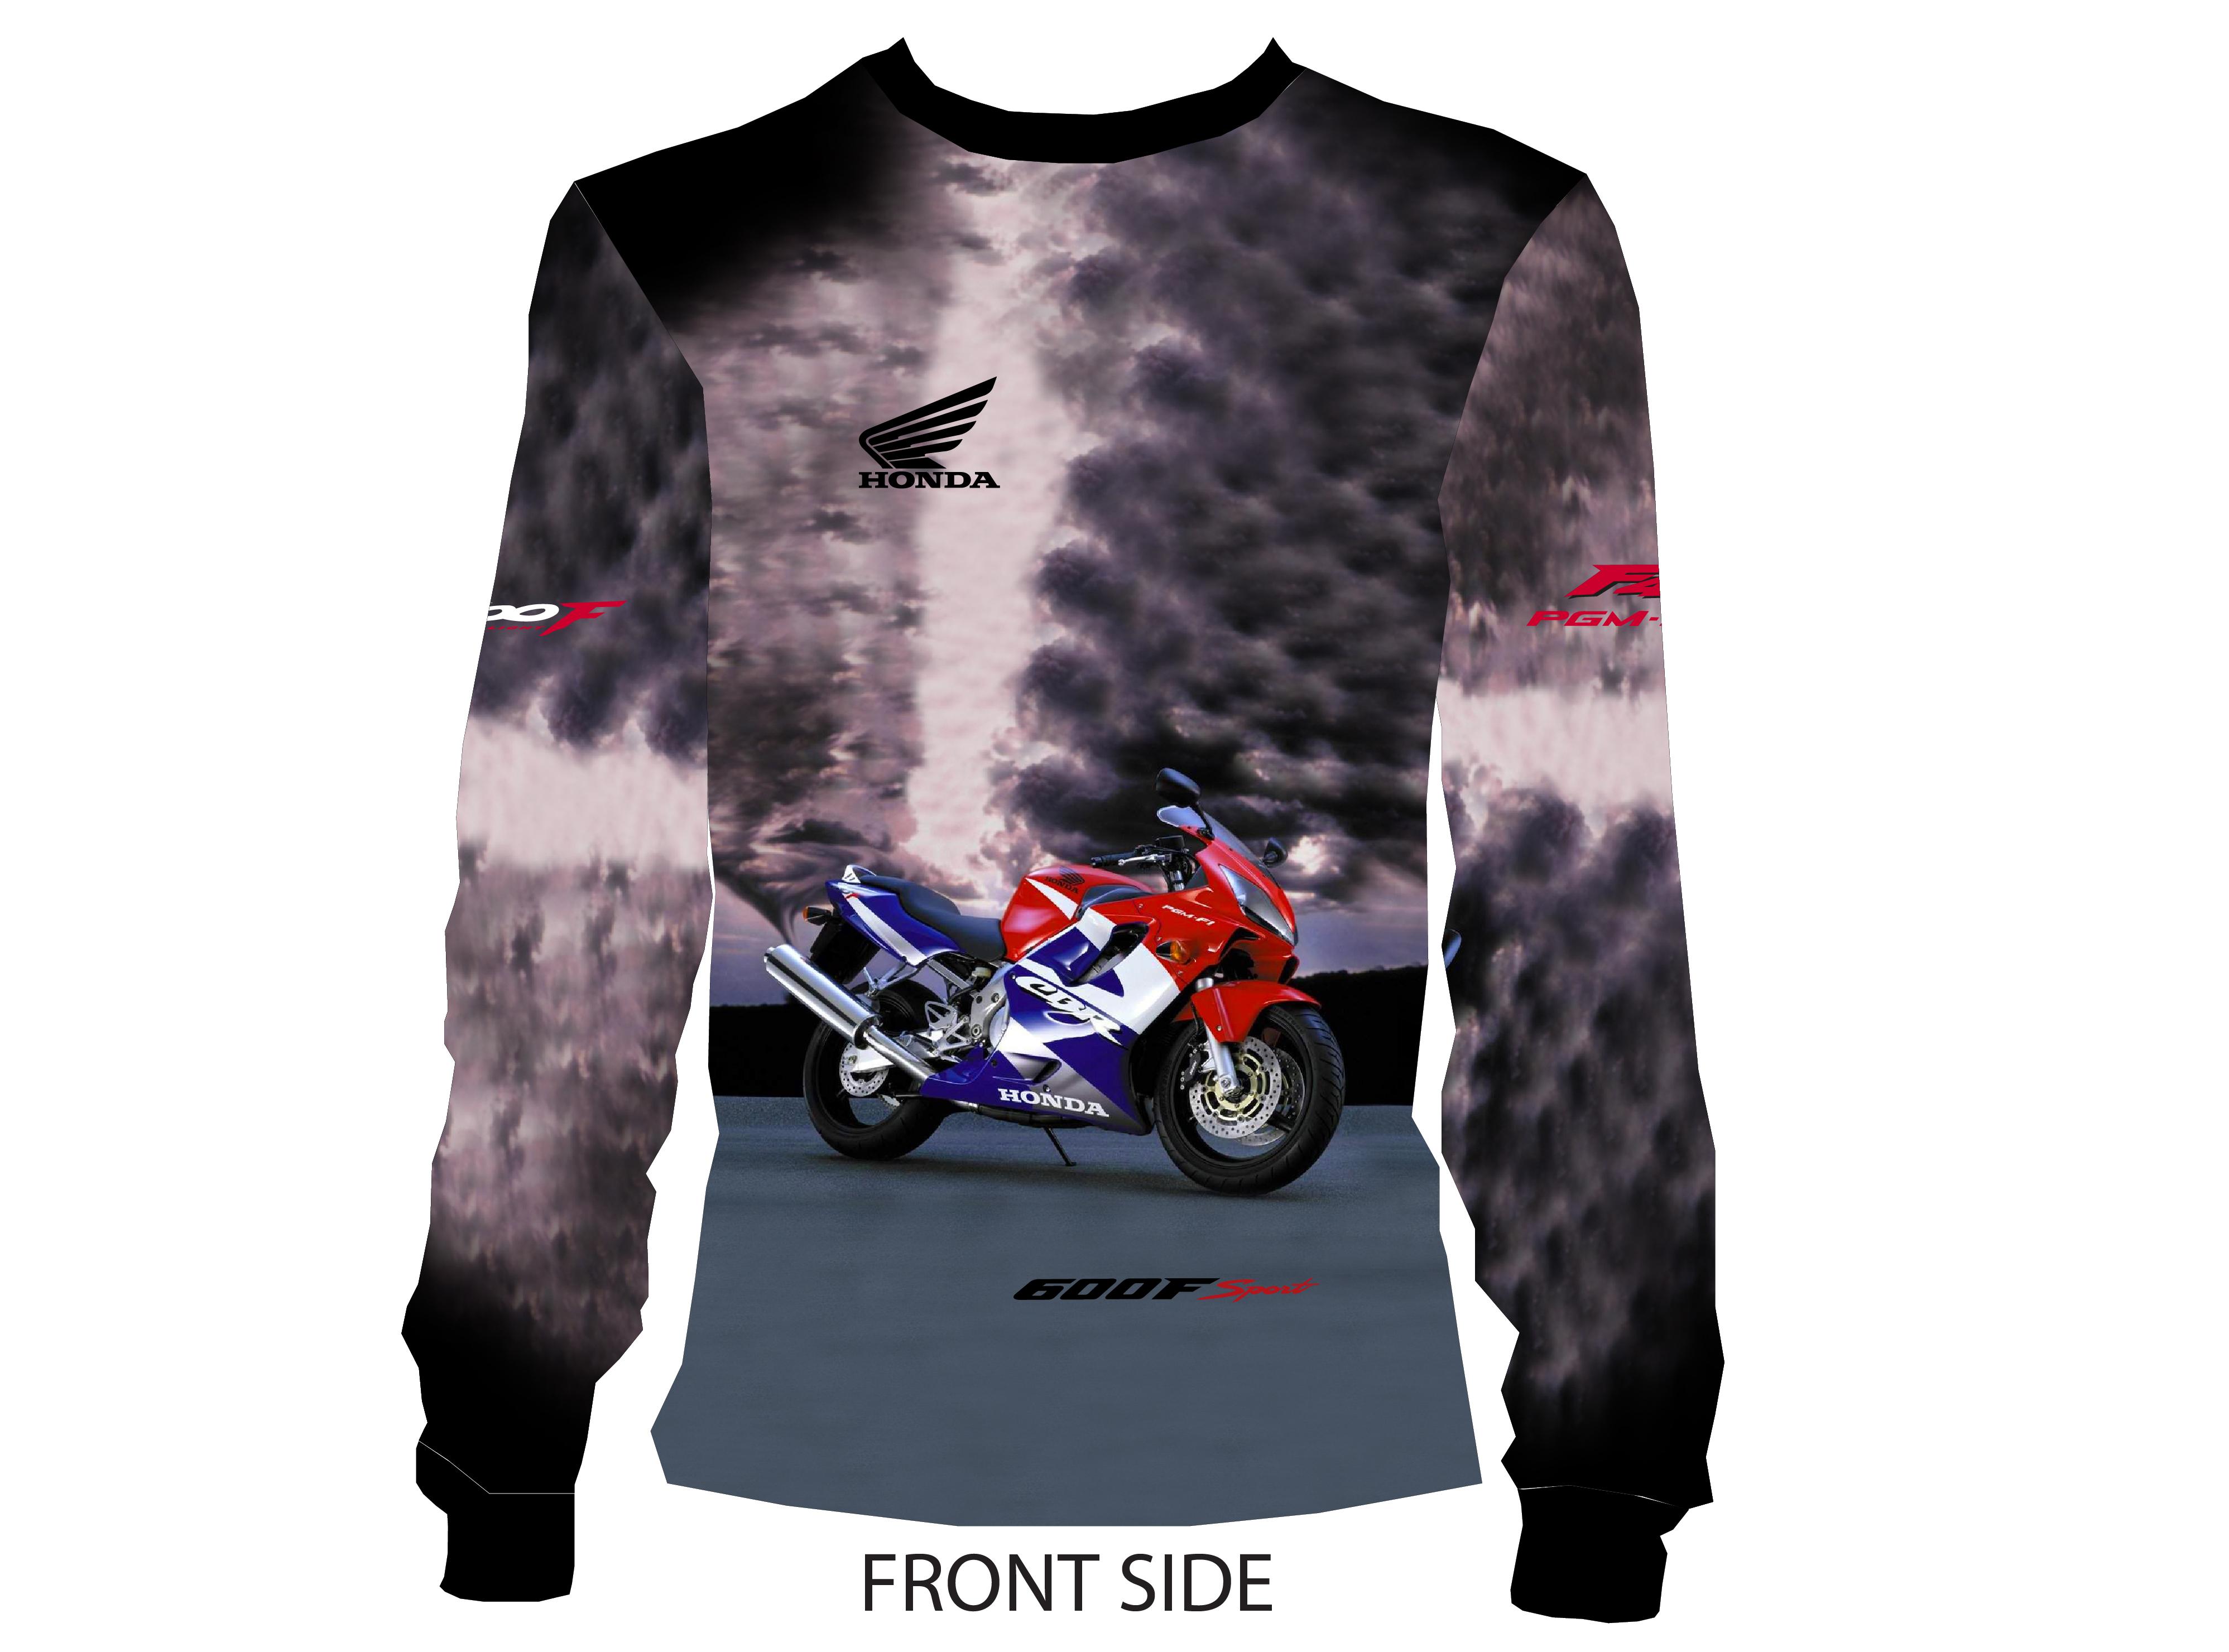 Honda CBR 600F F4i Sport crew neck sweatshirt